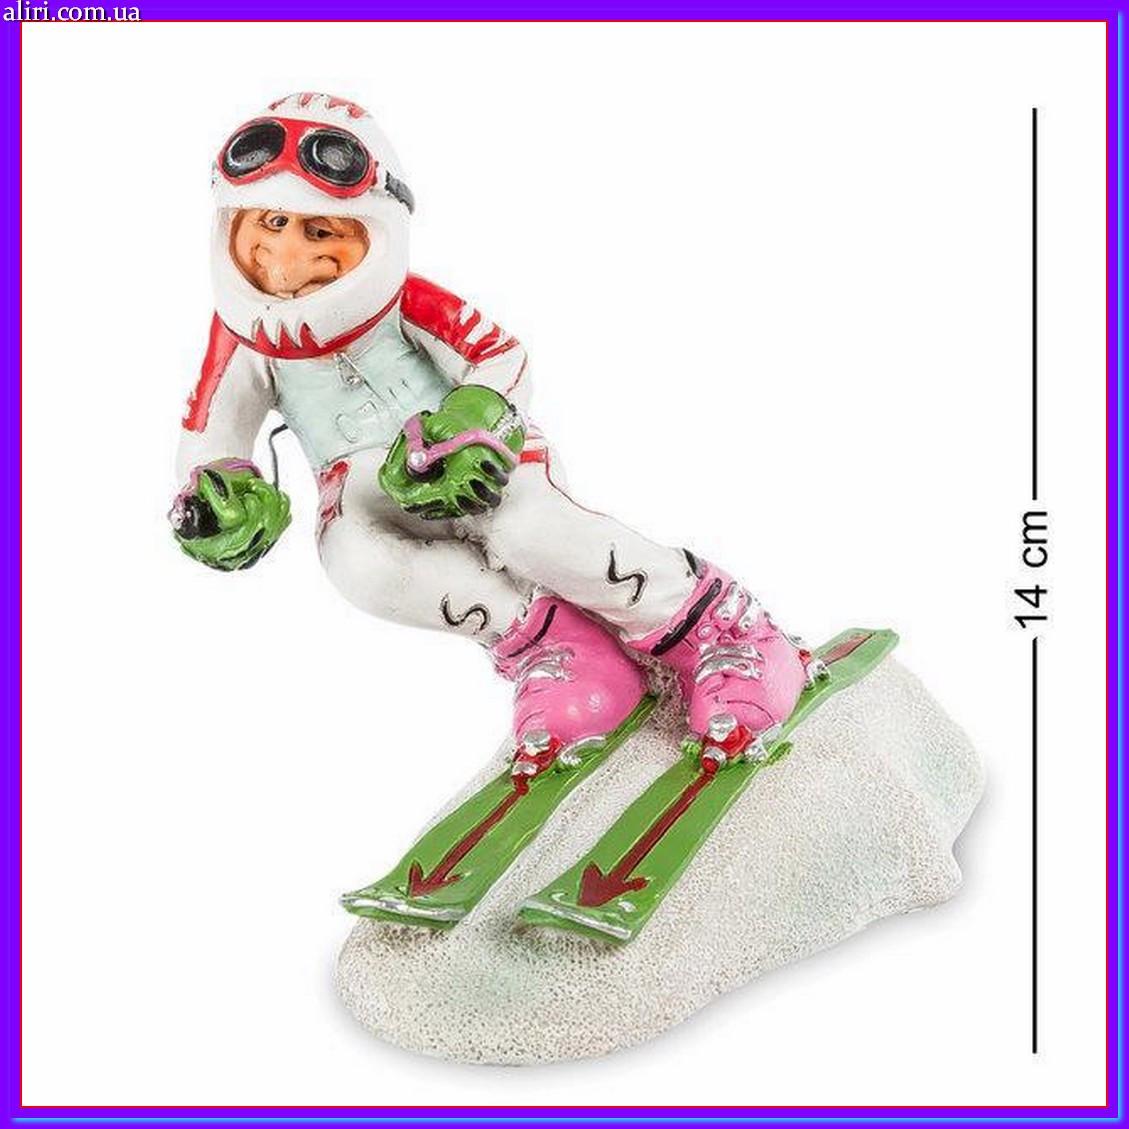 Статуэтка Горные лыжи Stratford супер подарок